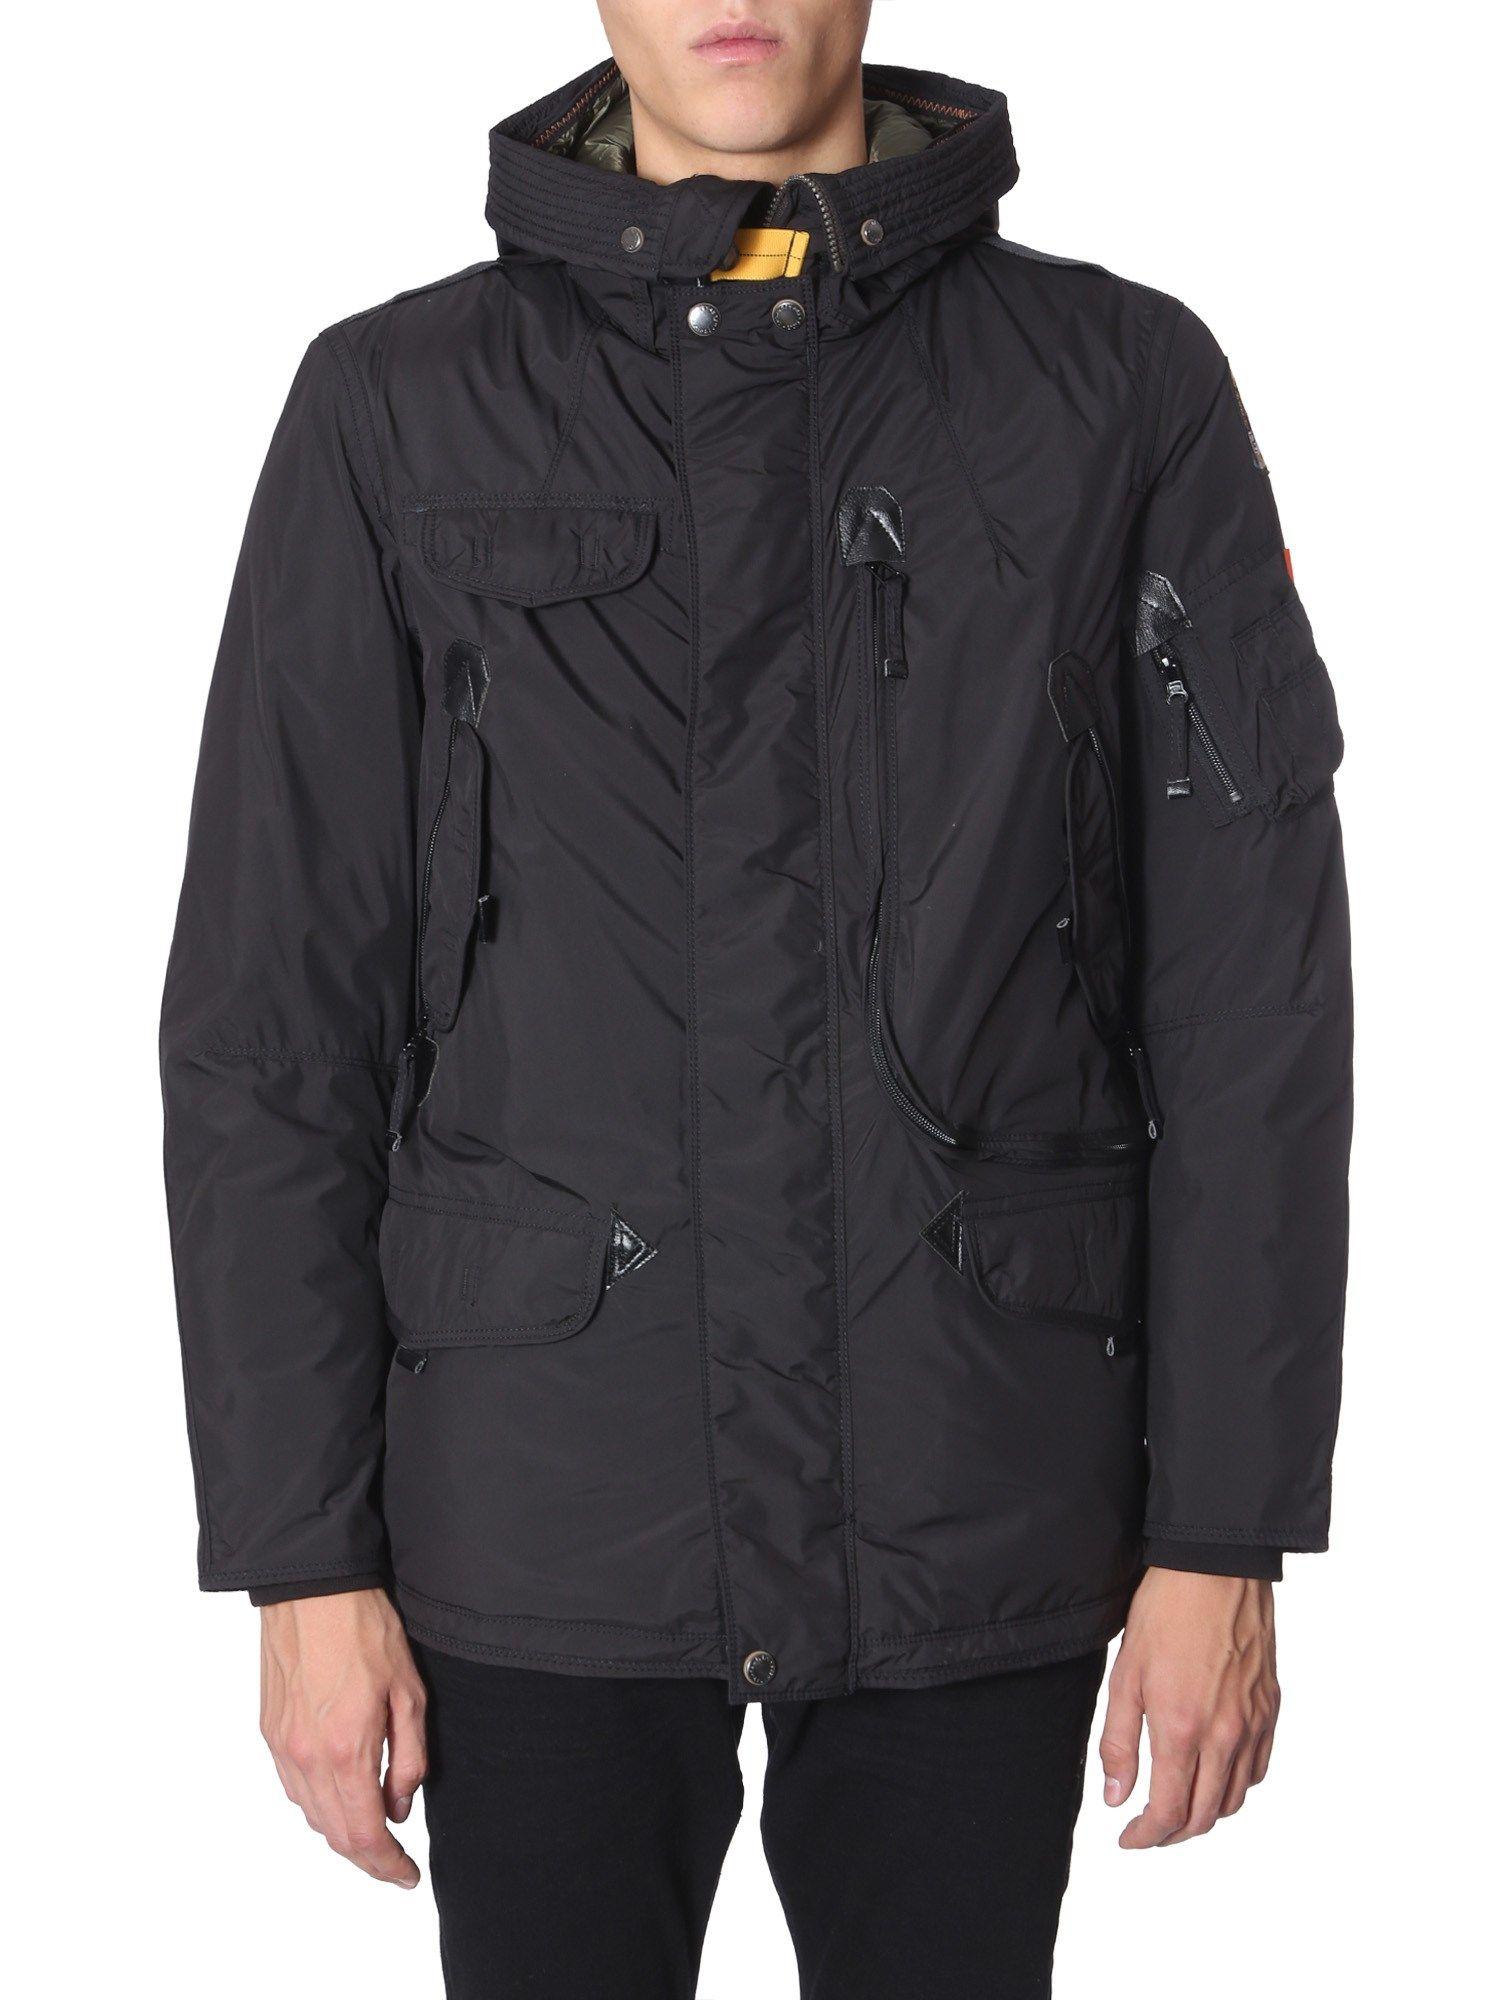 Righthand Light Jacket Light Jacket Jackets Outerwear Jackets [ 2000 x 1500 Pixel ]